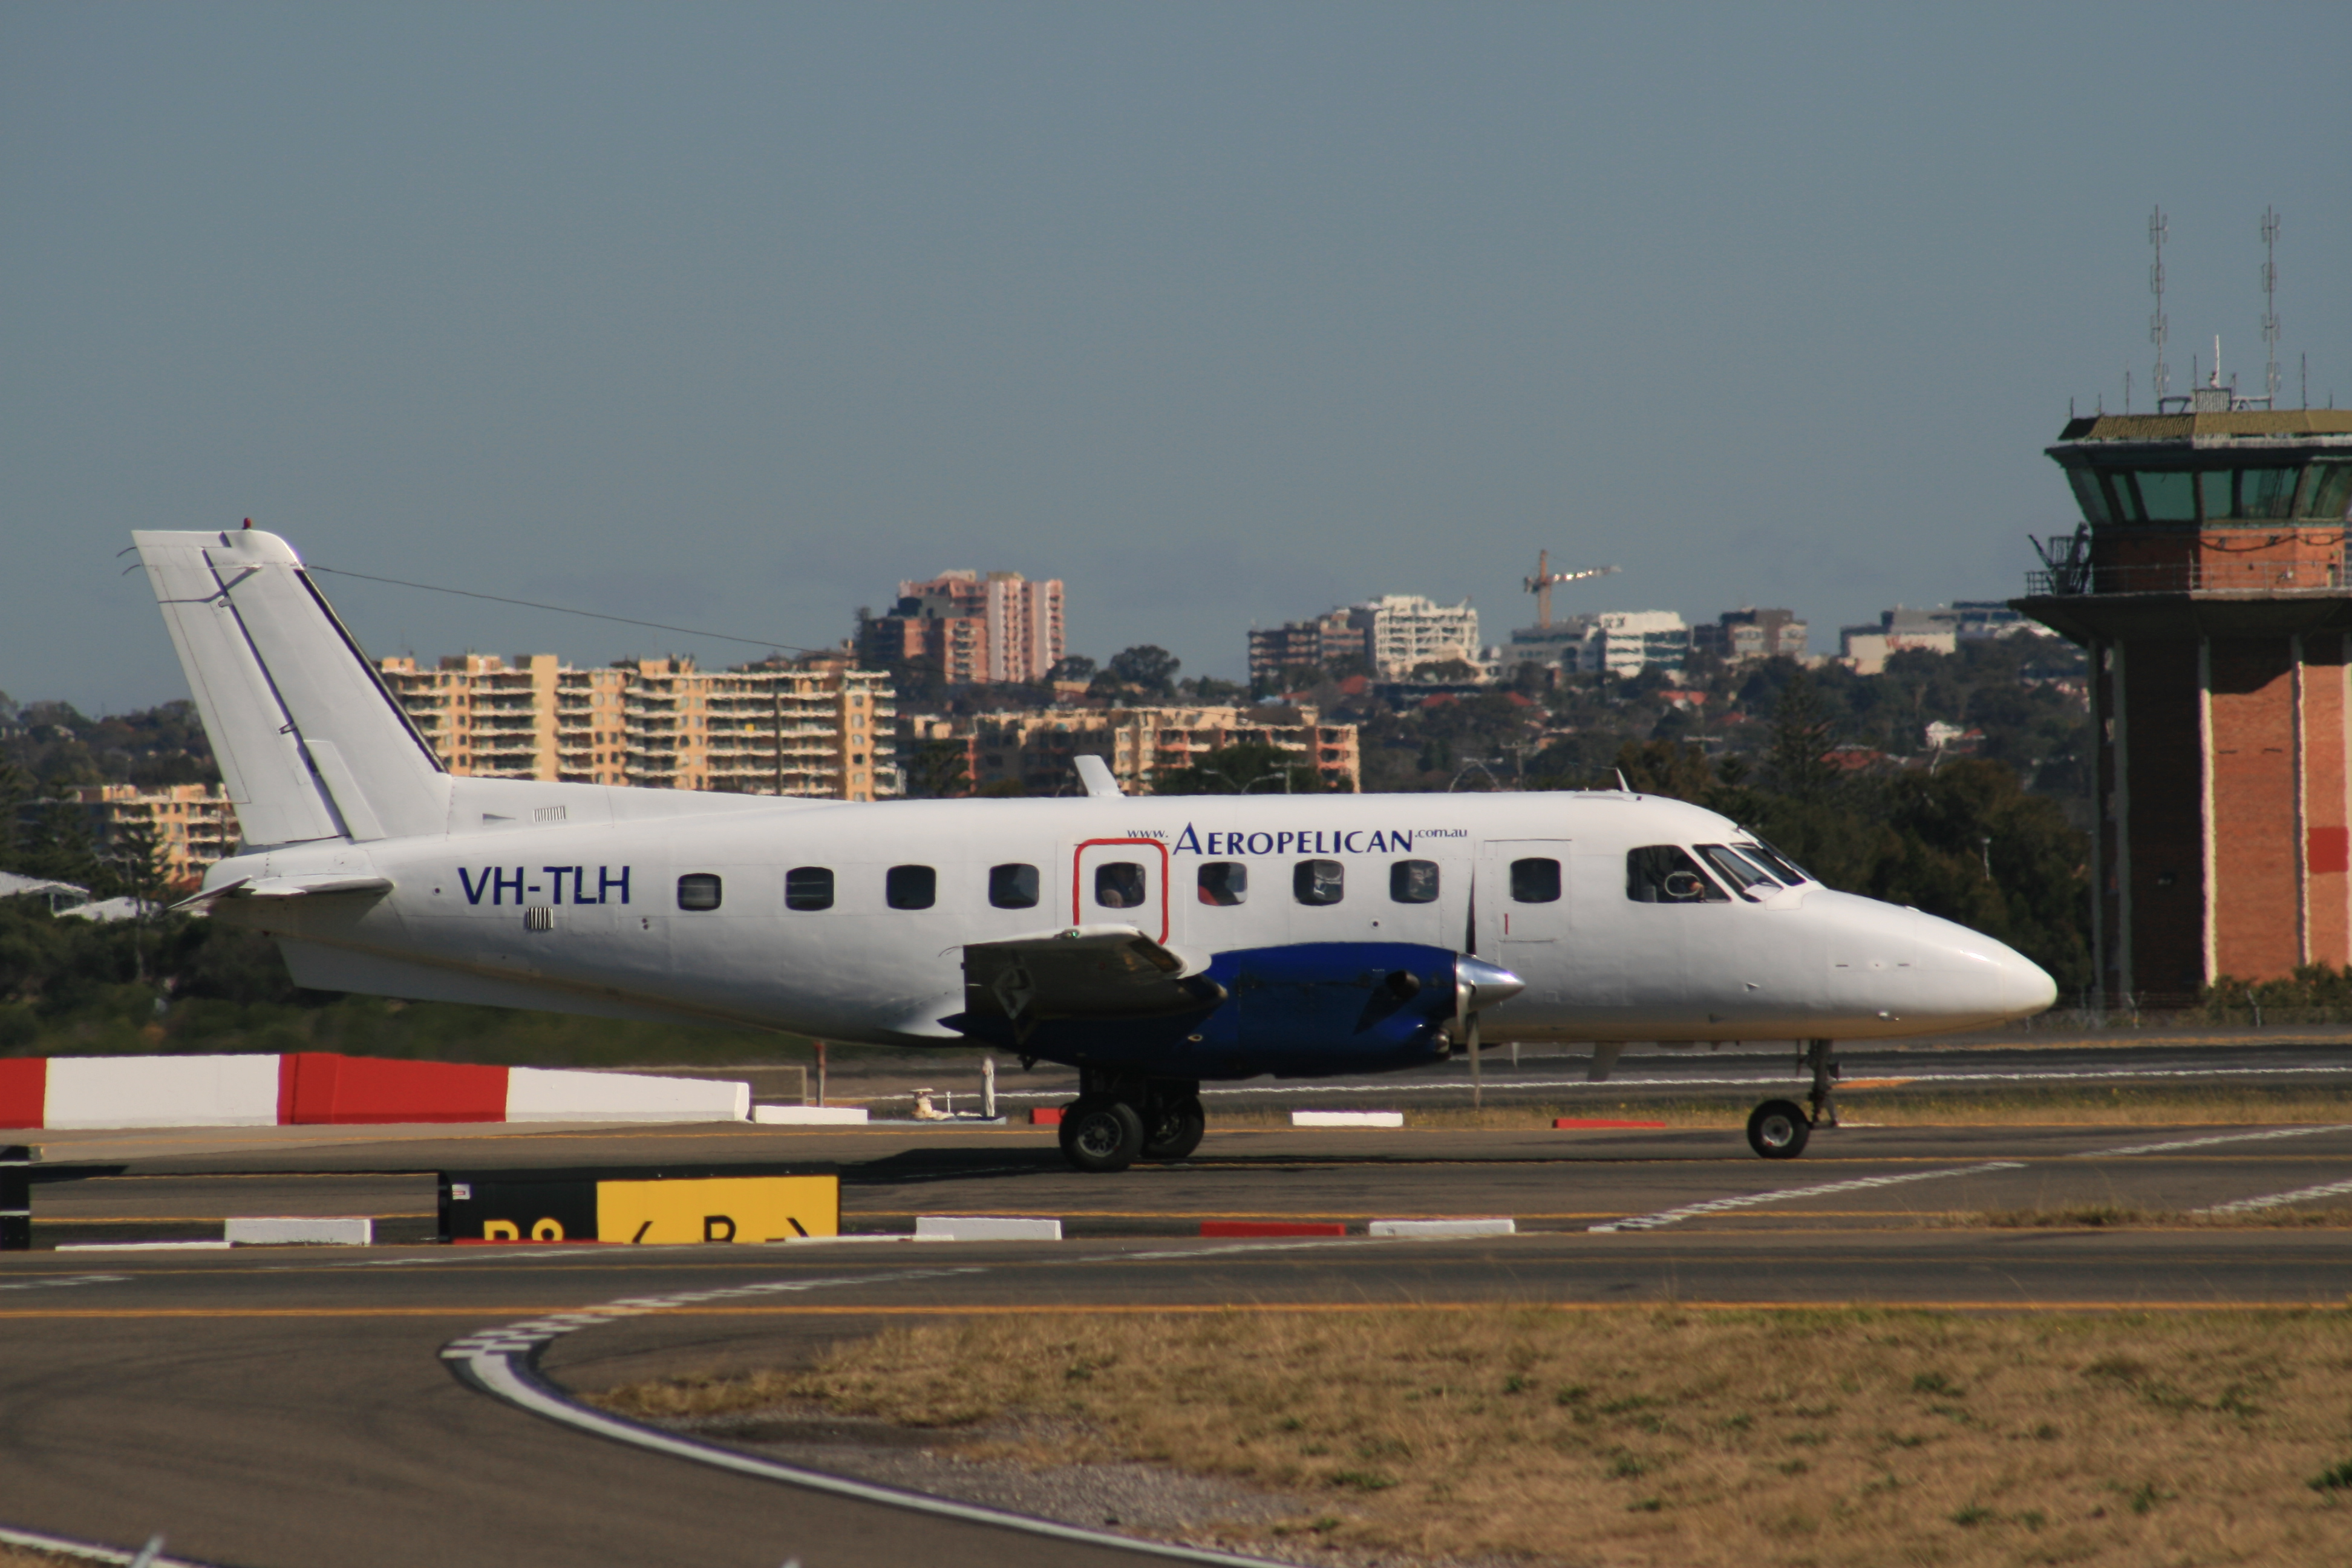 Datei:Aeropelican Air Services Embraer EMB-110 Bandeirante VH-TLH.jpg –  Wikipedia